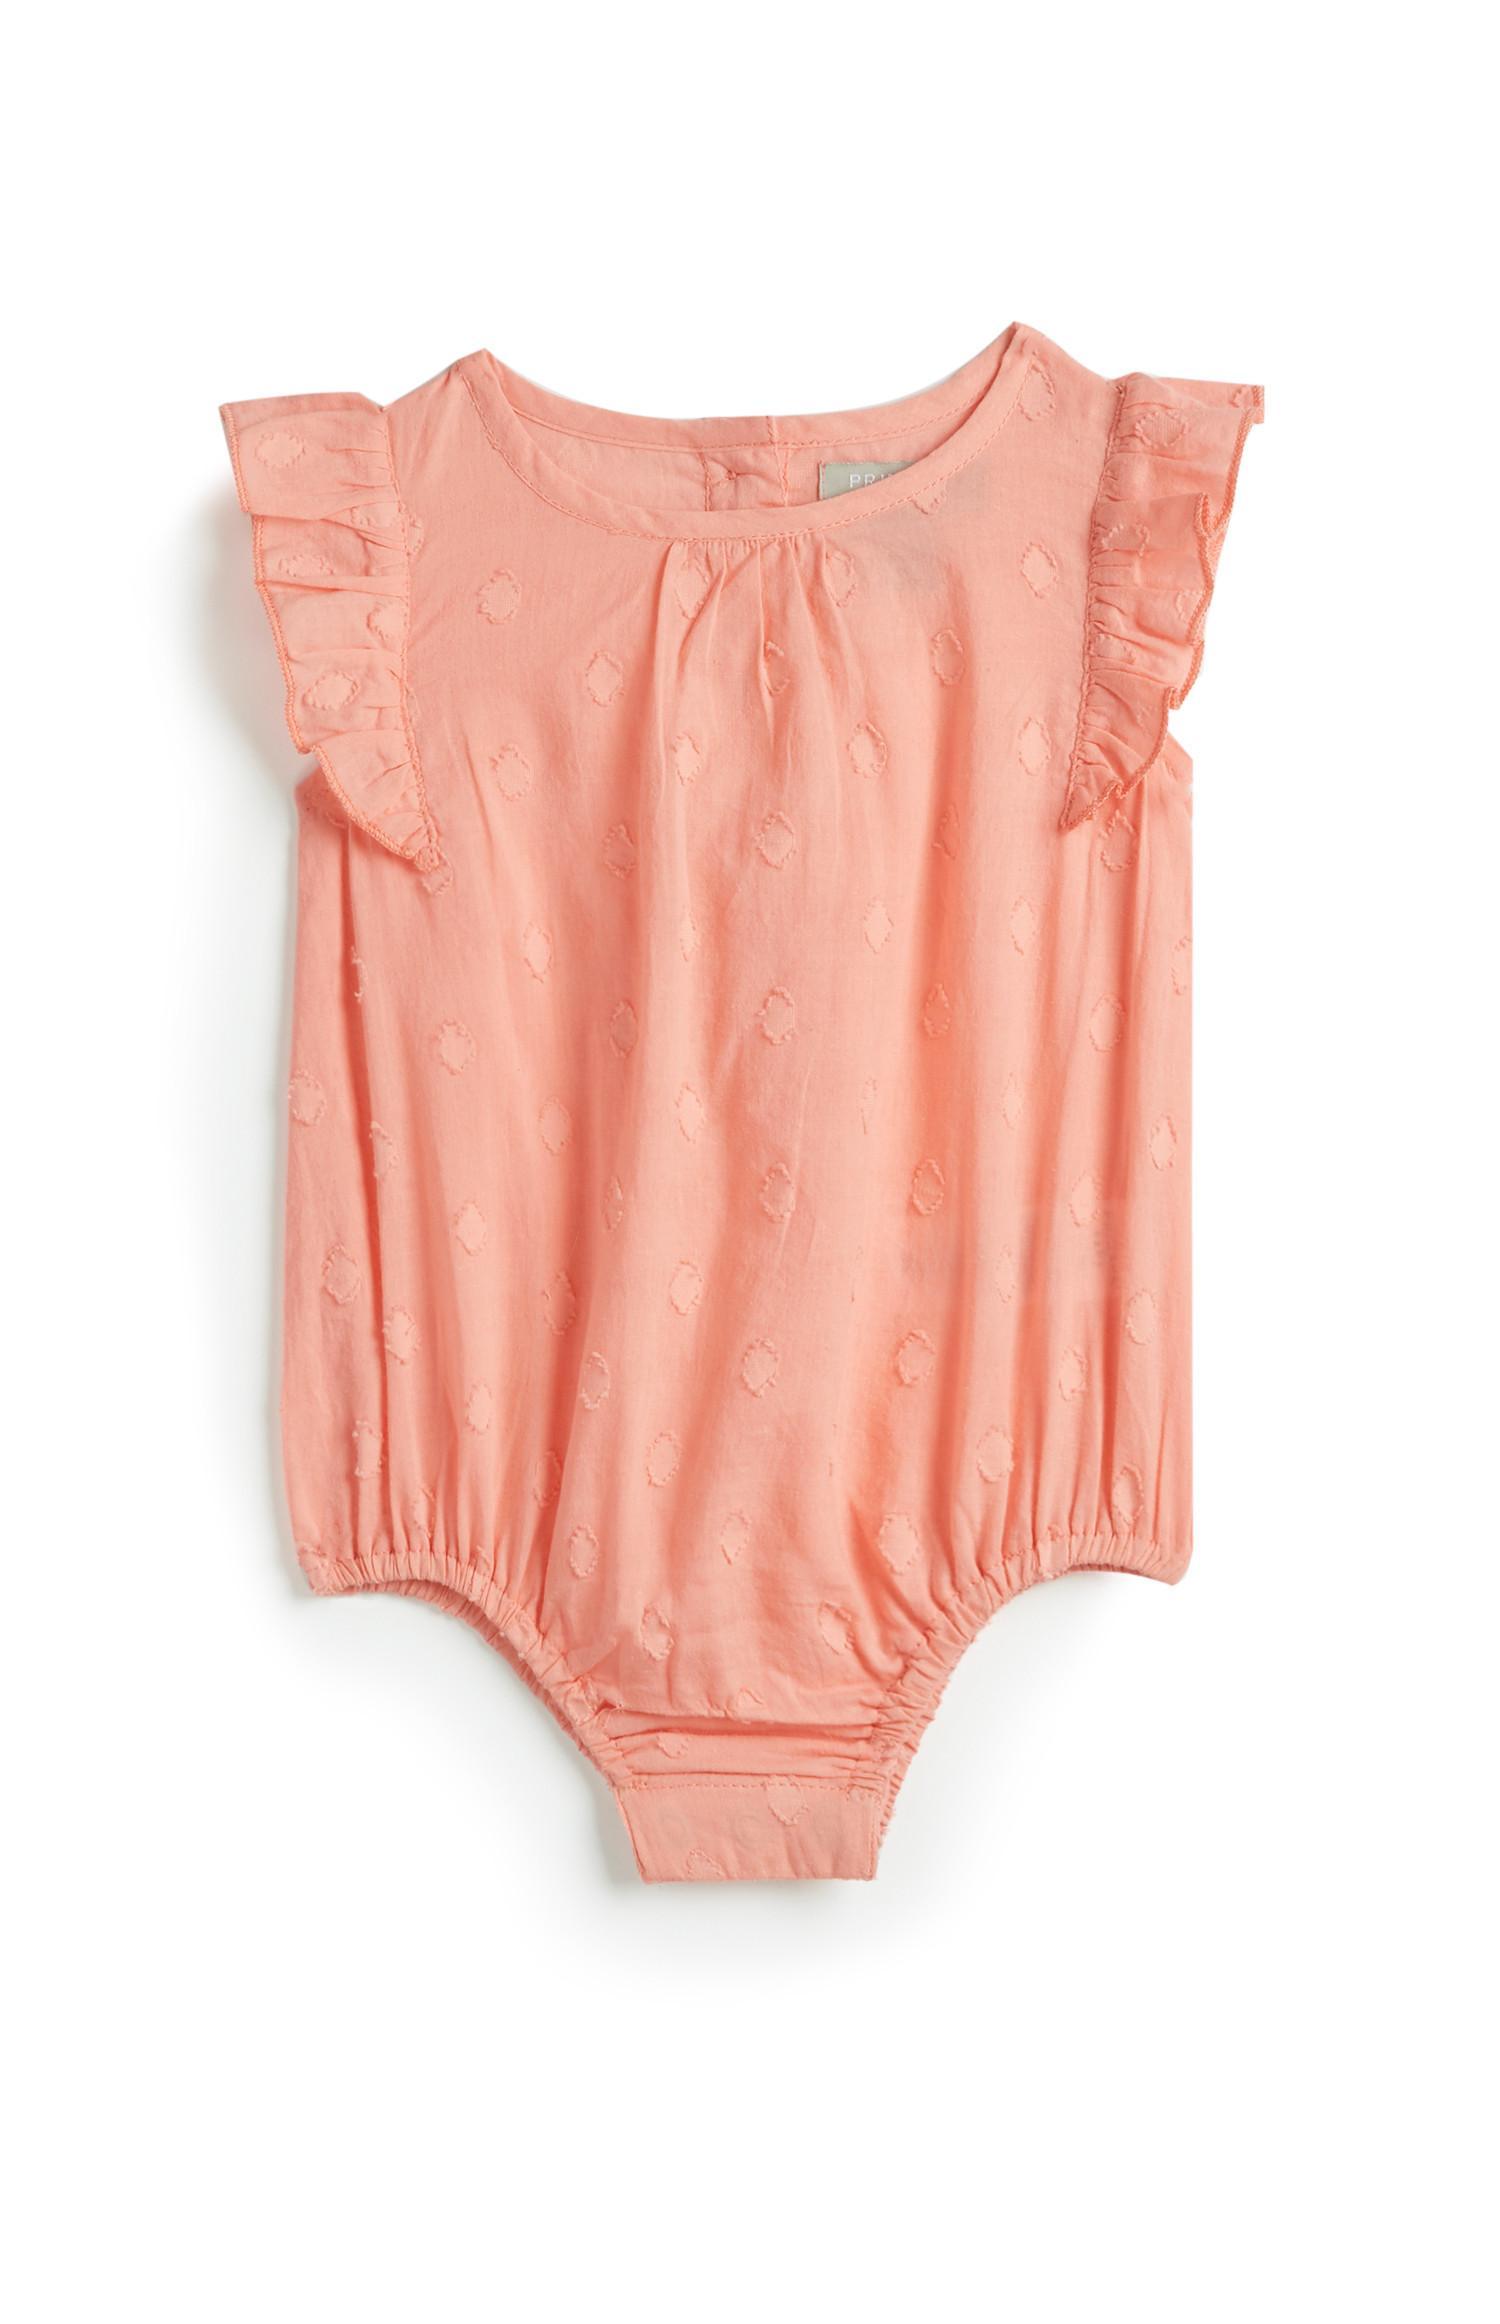 Babygrow recém-nascida cor-de-rosa